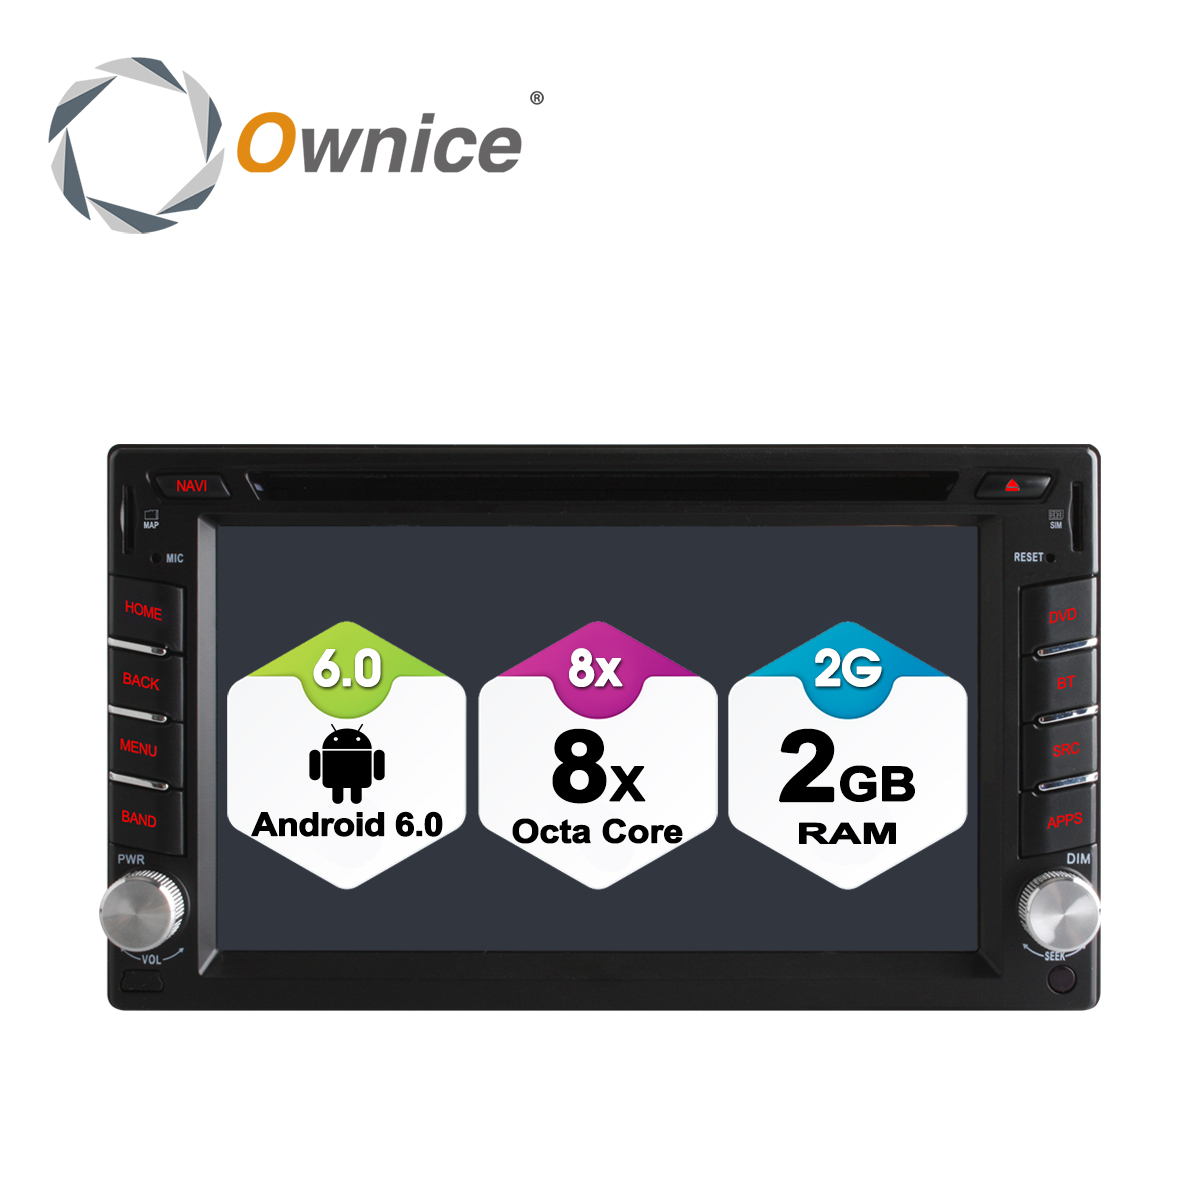 Ownice 4G SIM LTE Android 6 0 Octa Core 2G RAM Universal font b Car b